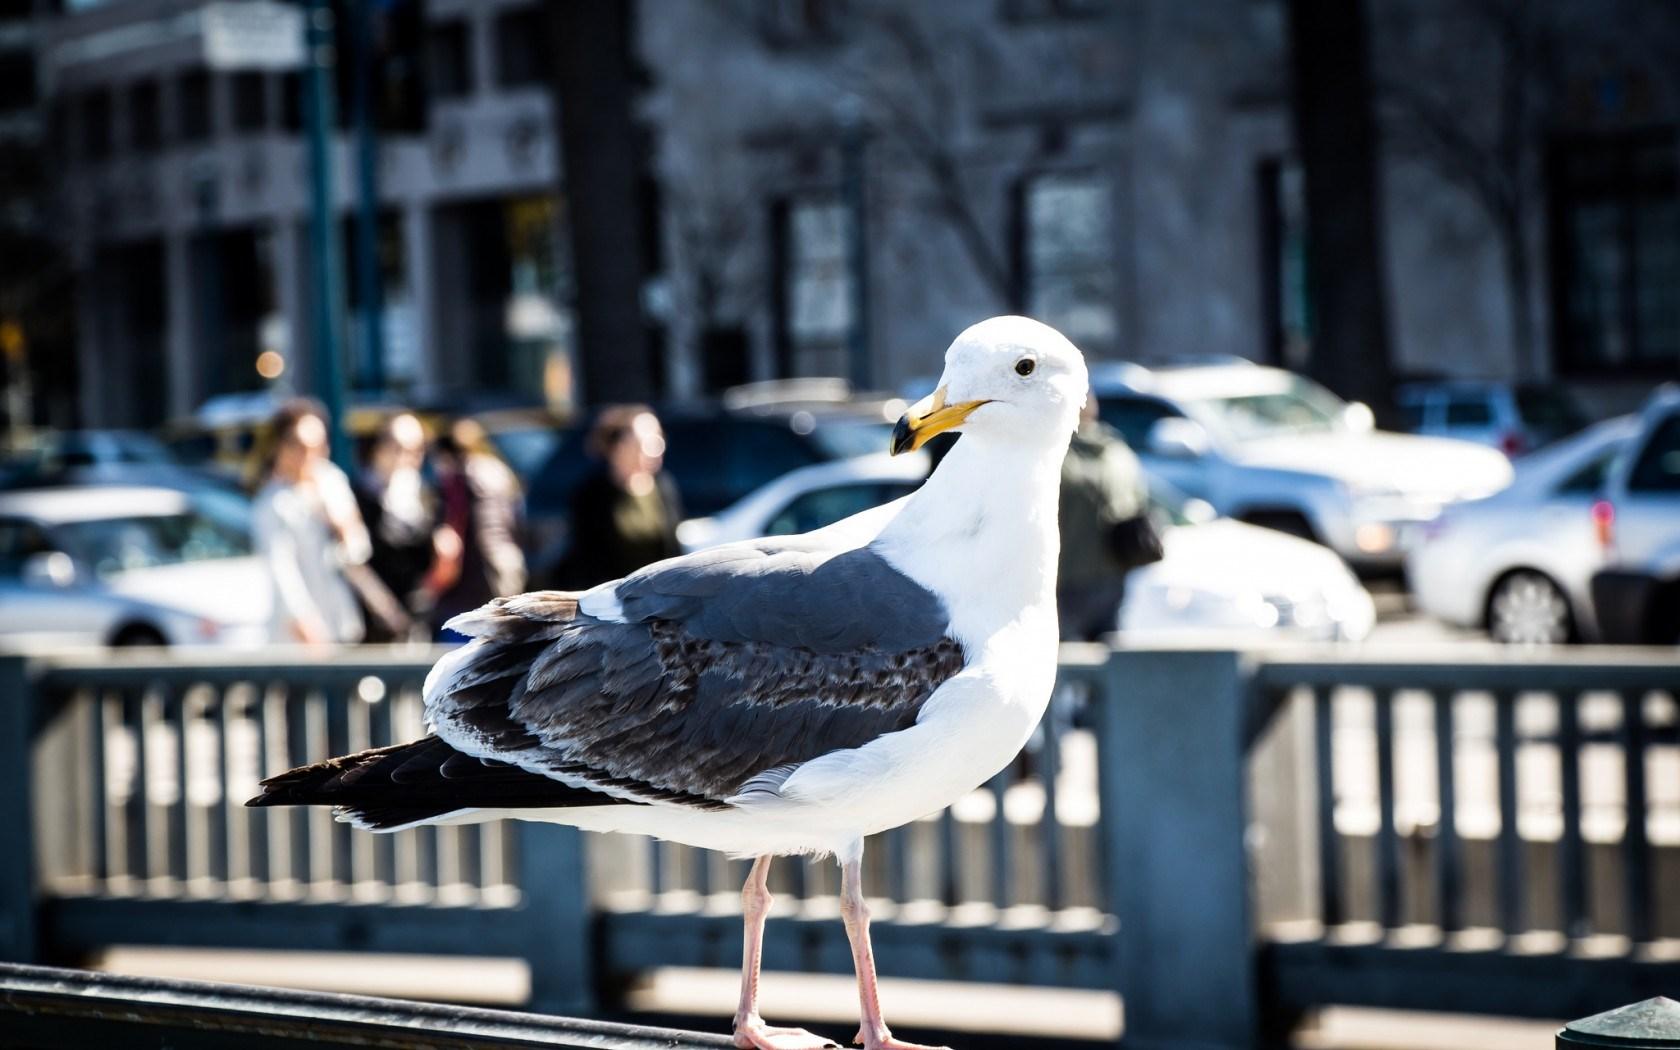 seagull beautiful desktop background